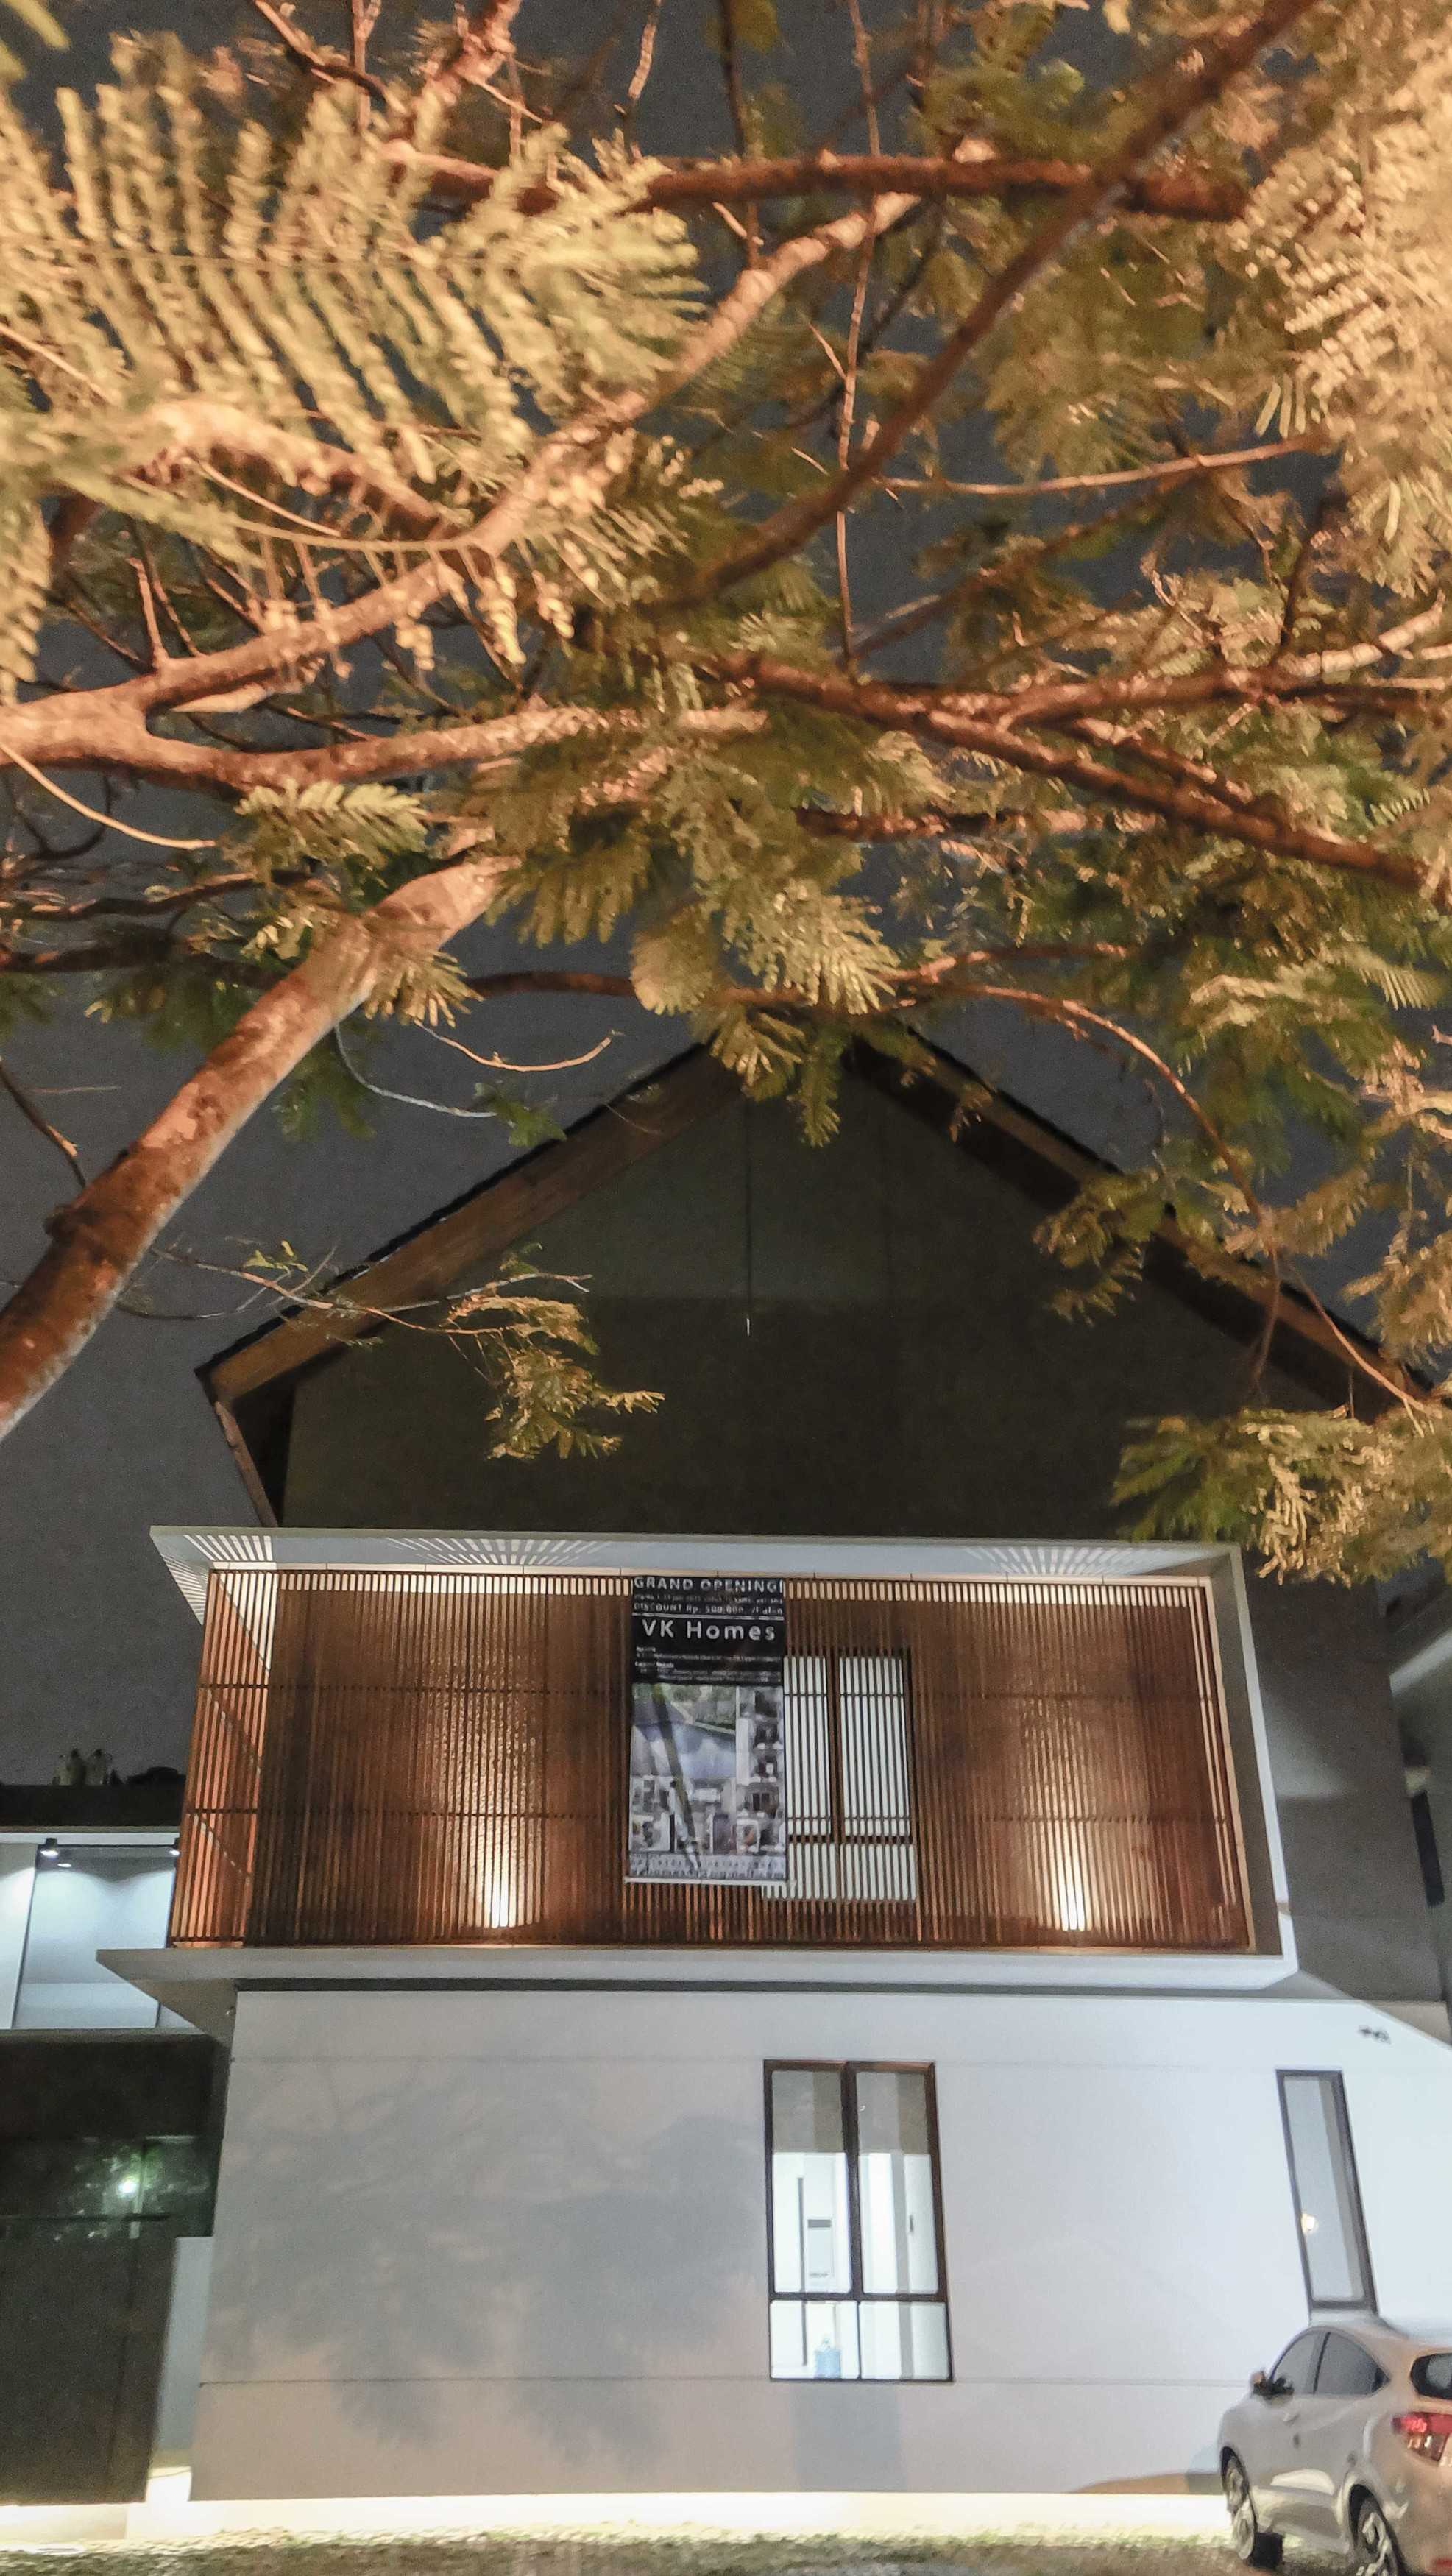 Gohte Architects Vk Homes Lippo Karawaci, Binong, Kec. Curug, Tangerang, Banten, Indonesia Lippo Karawaci, Binong, Kec. Curug, Tangerang, Banten, Indonesia Gohte-Architects-Vk-Homes   96618